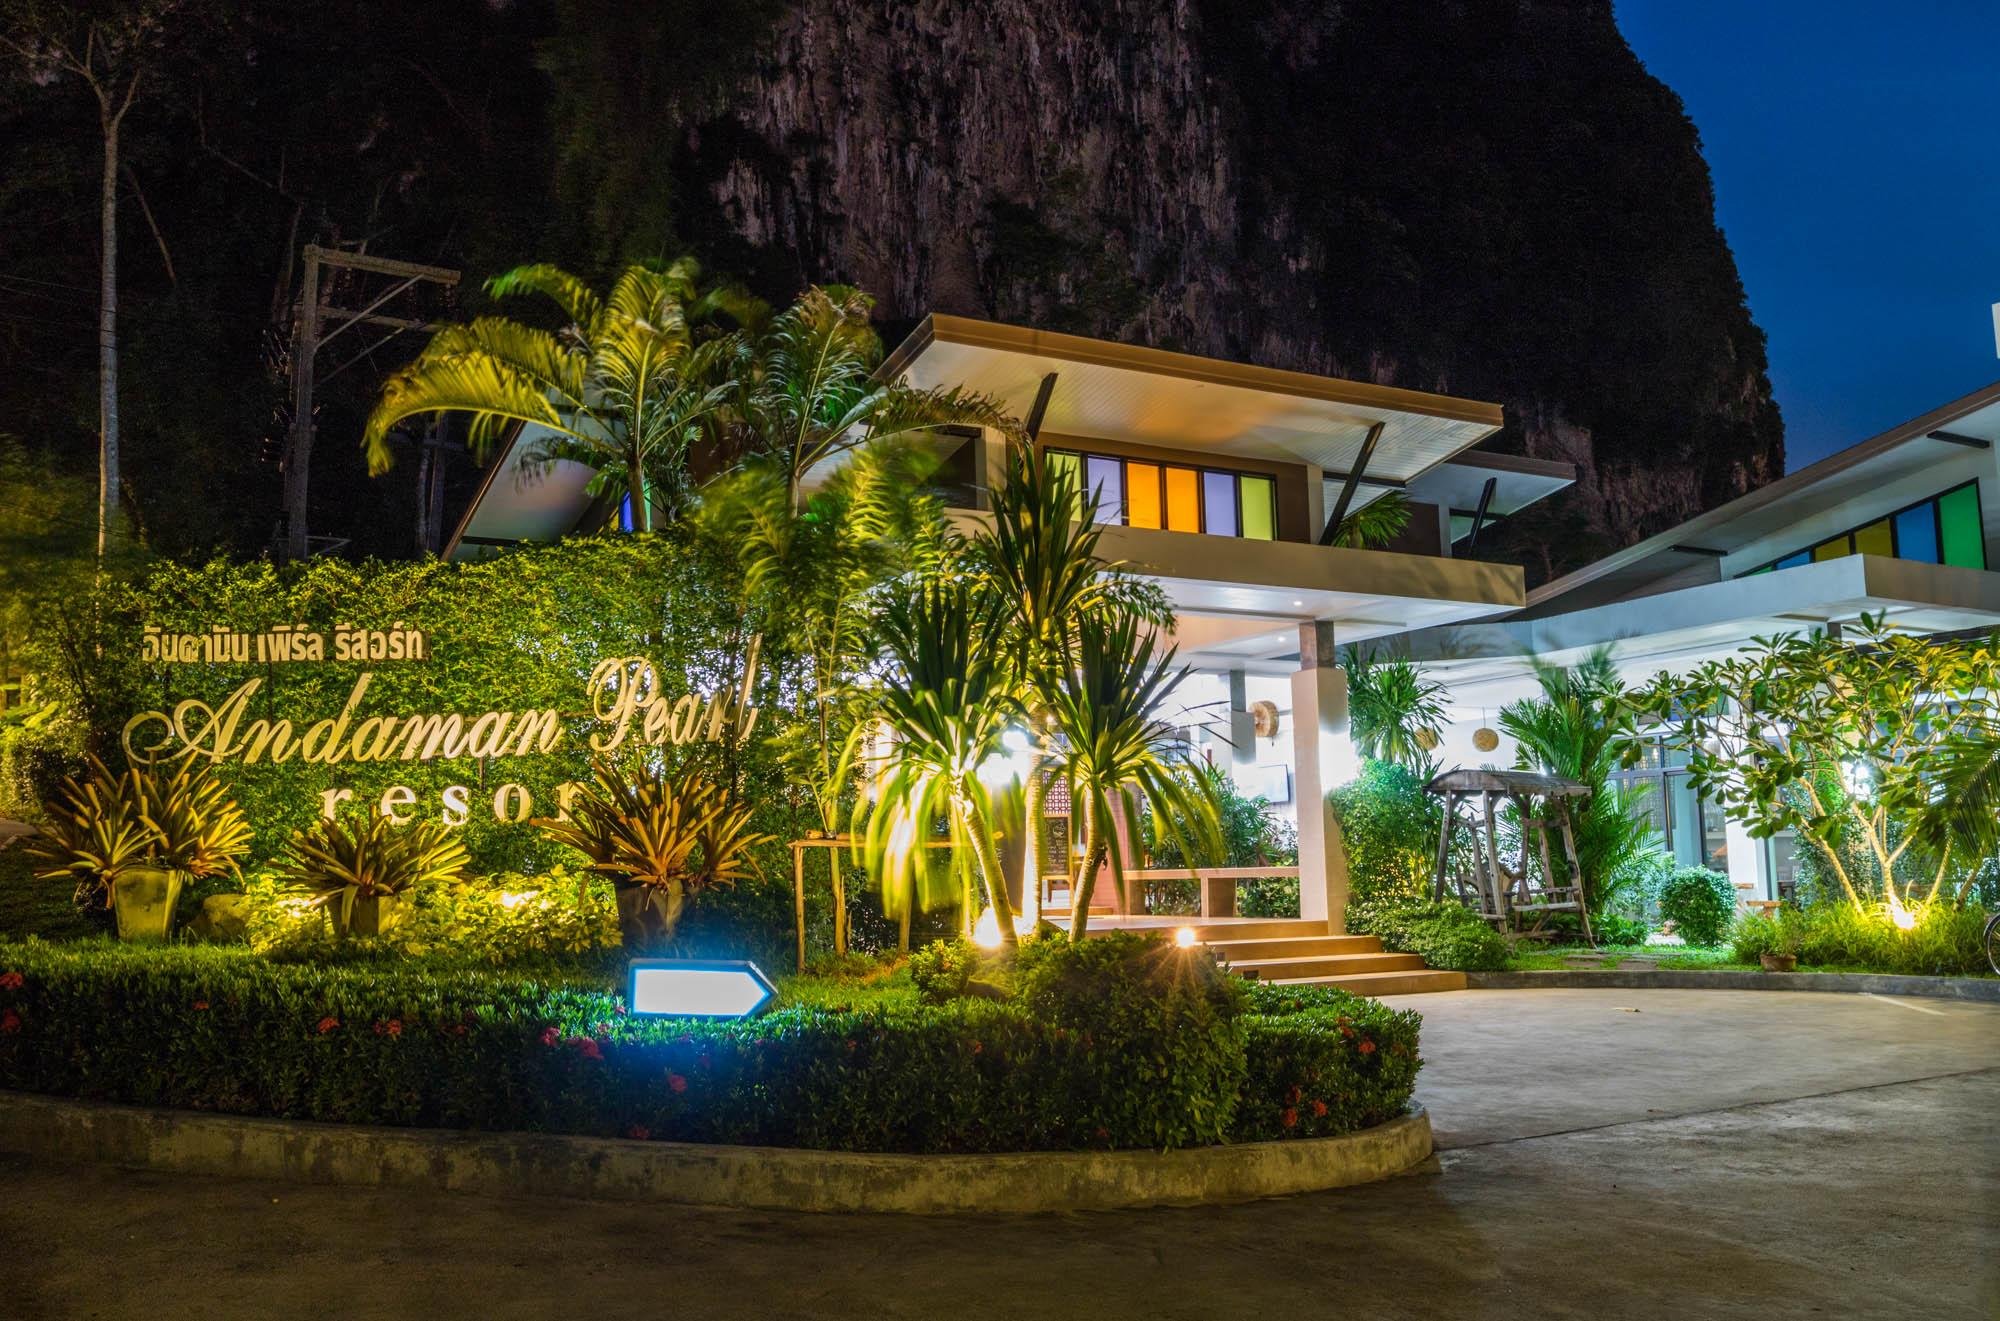 Andaman Pearl Resort อันดามัน เพิร์ล รีสอร์ต โรงแรมฮาลาล กระบี่  อันดามันเพิร์ล รีสอร์ท Andaman Pearl Resort Aonang IMG 5005